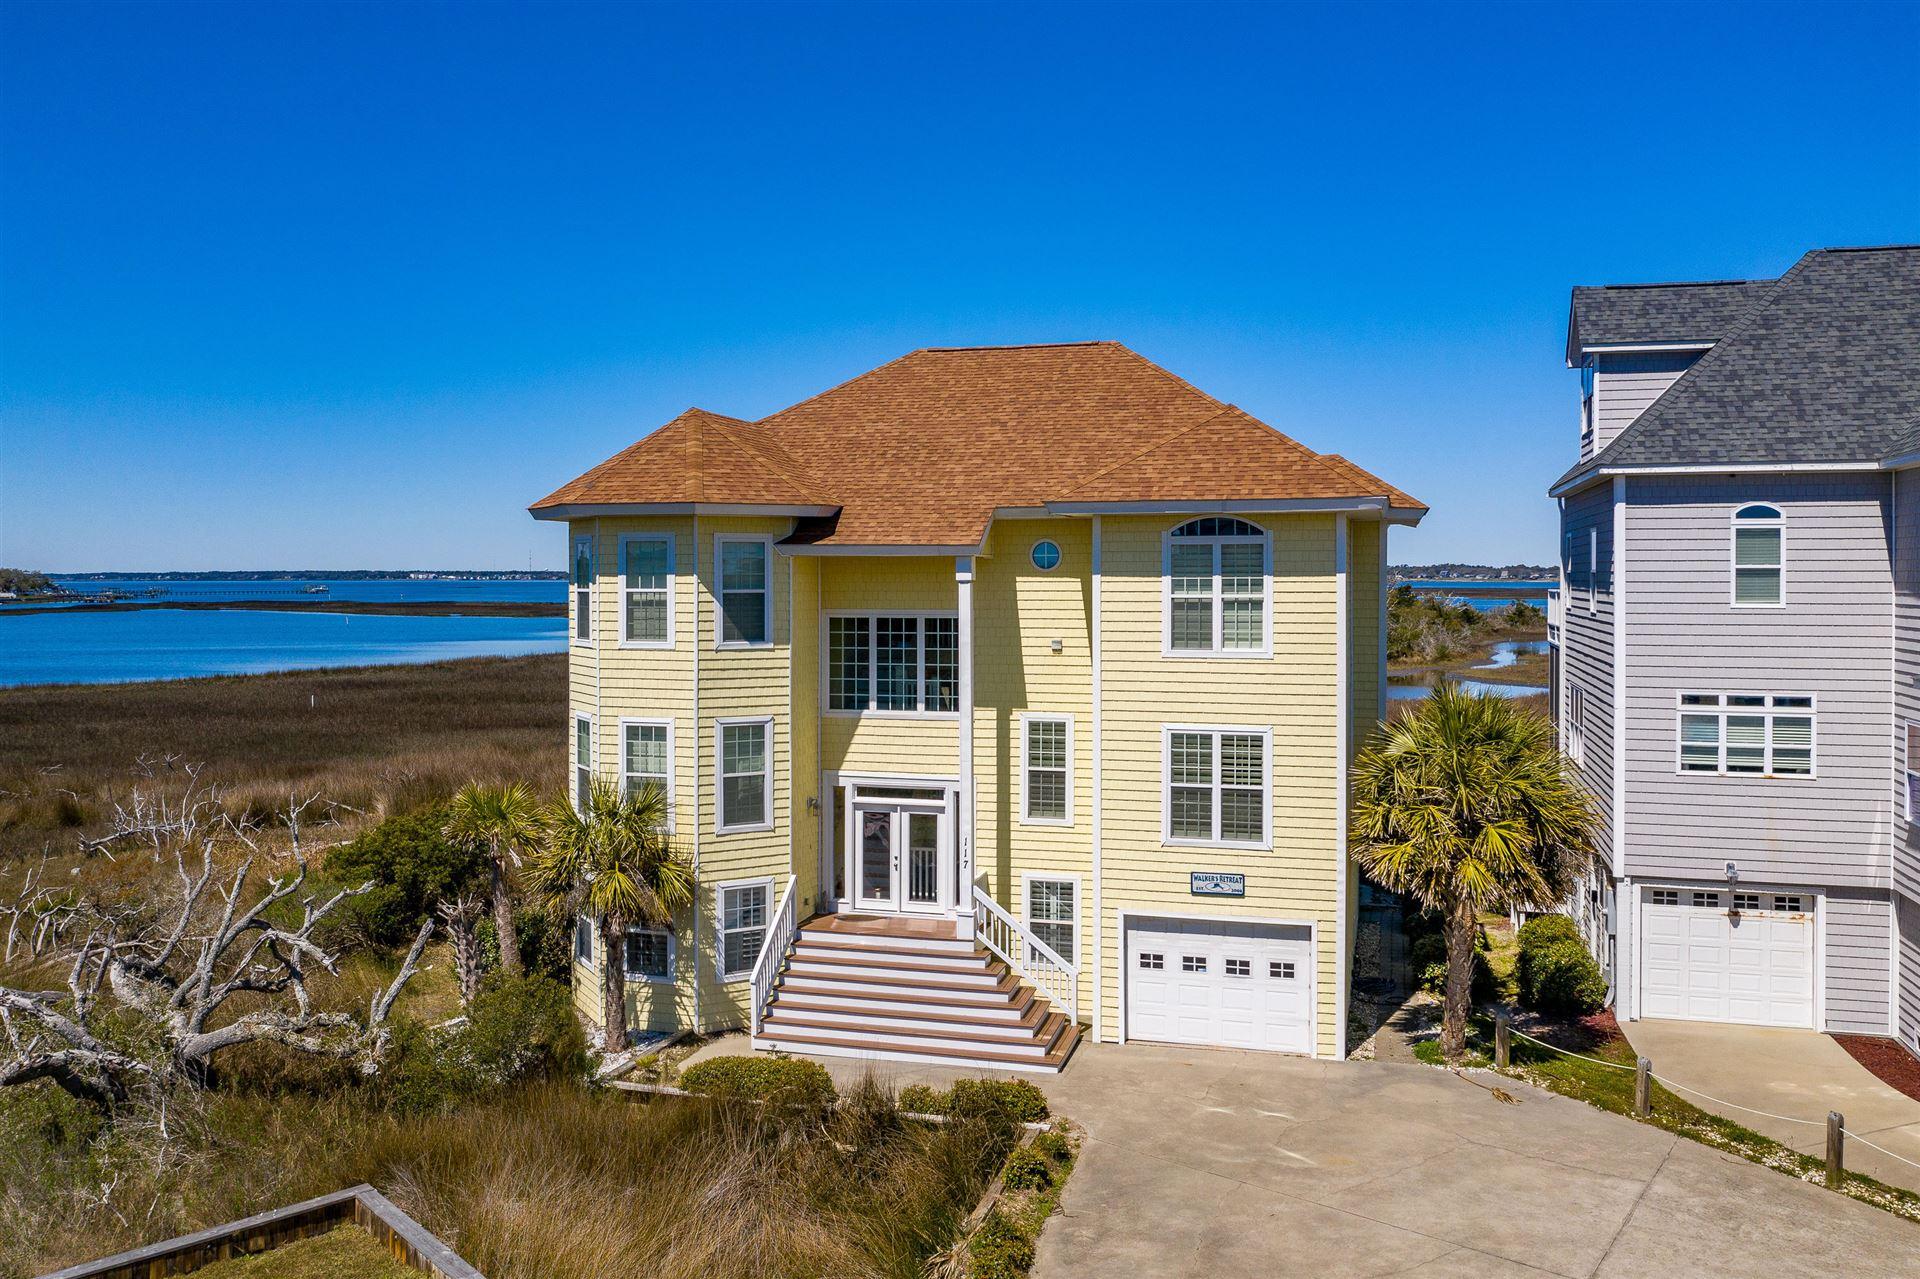 117 Coral Bay Court, Atlantic Beach, NC 28512 - #: 100263432